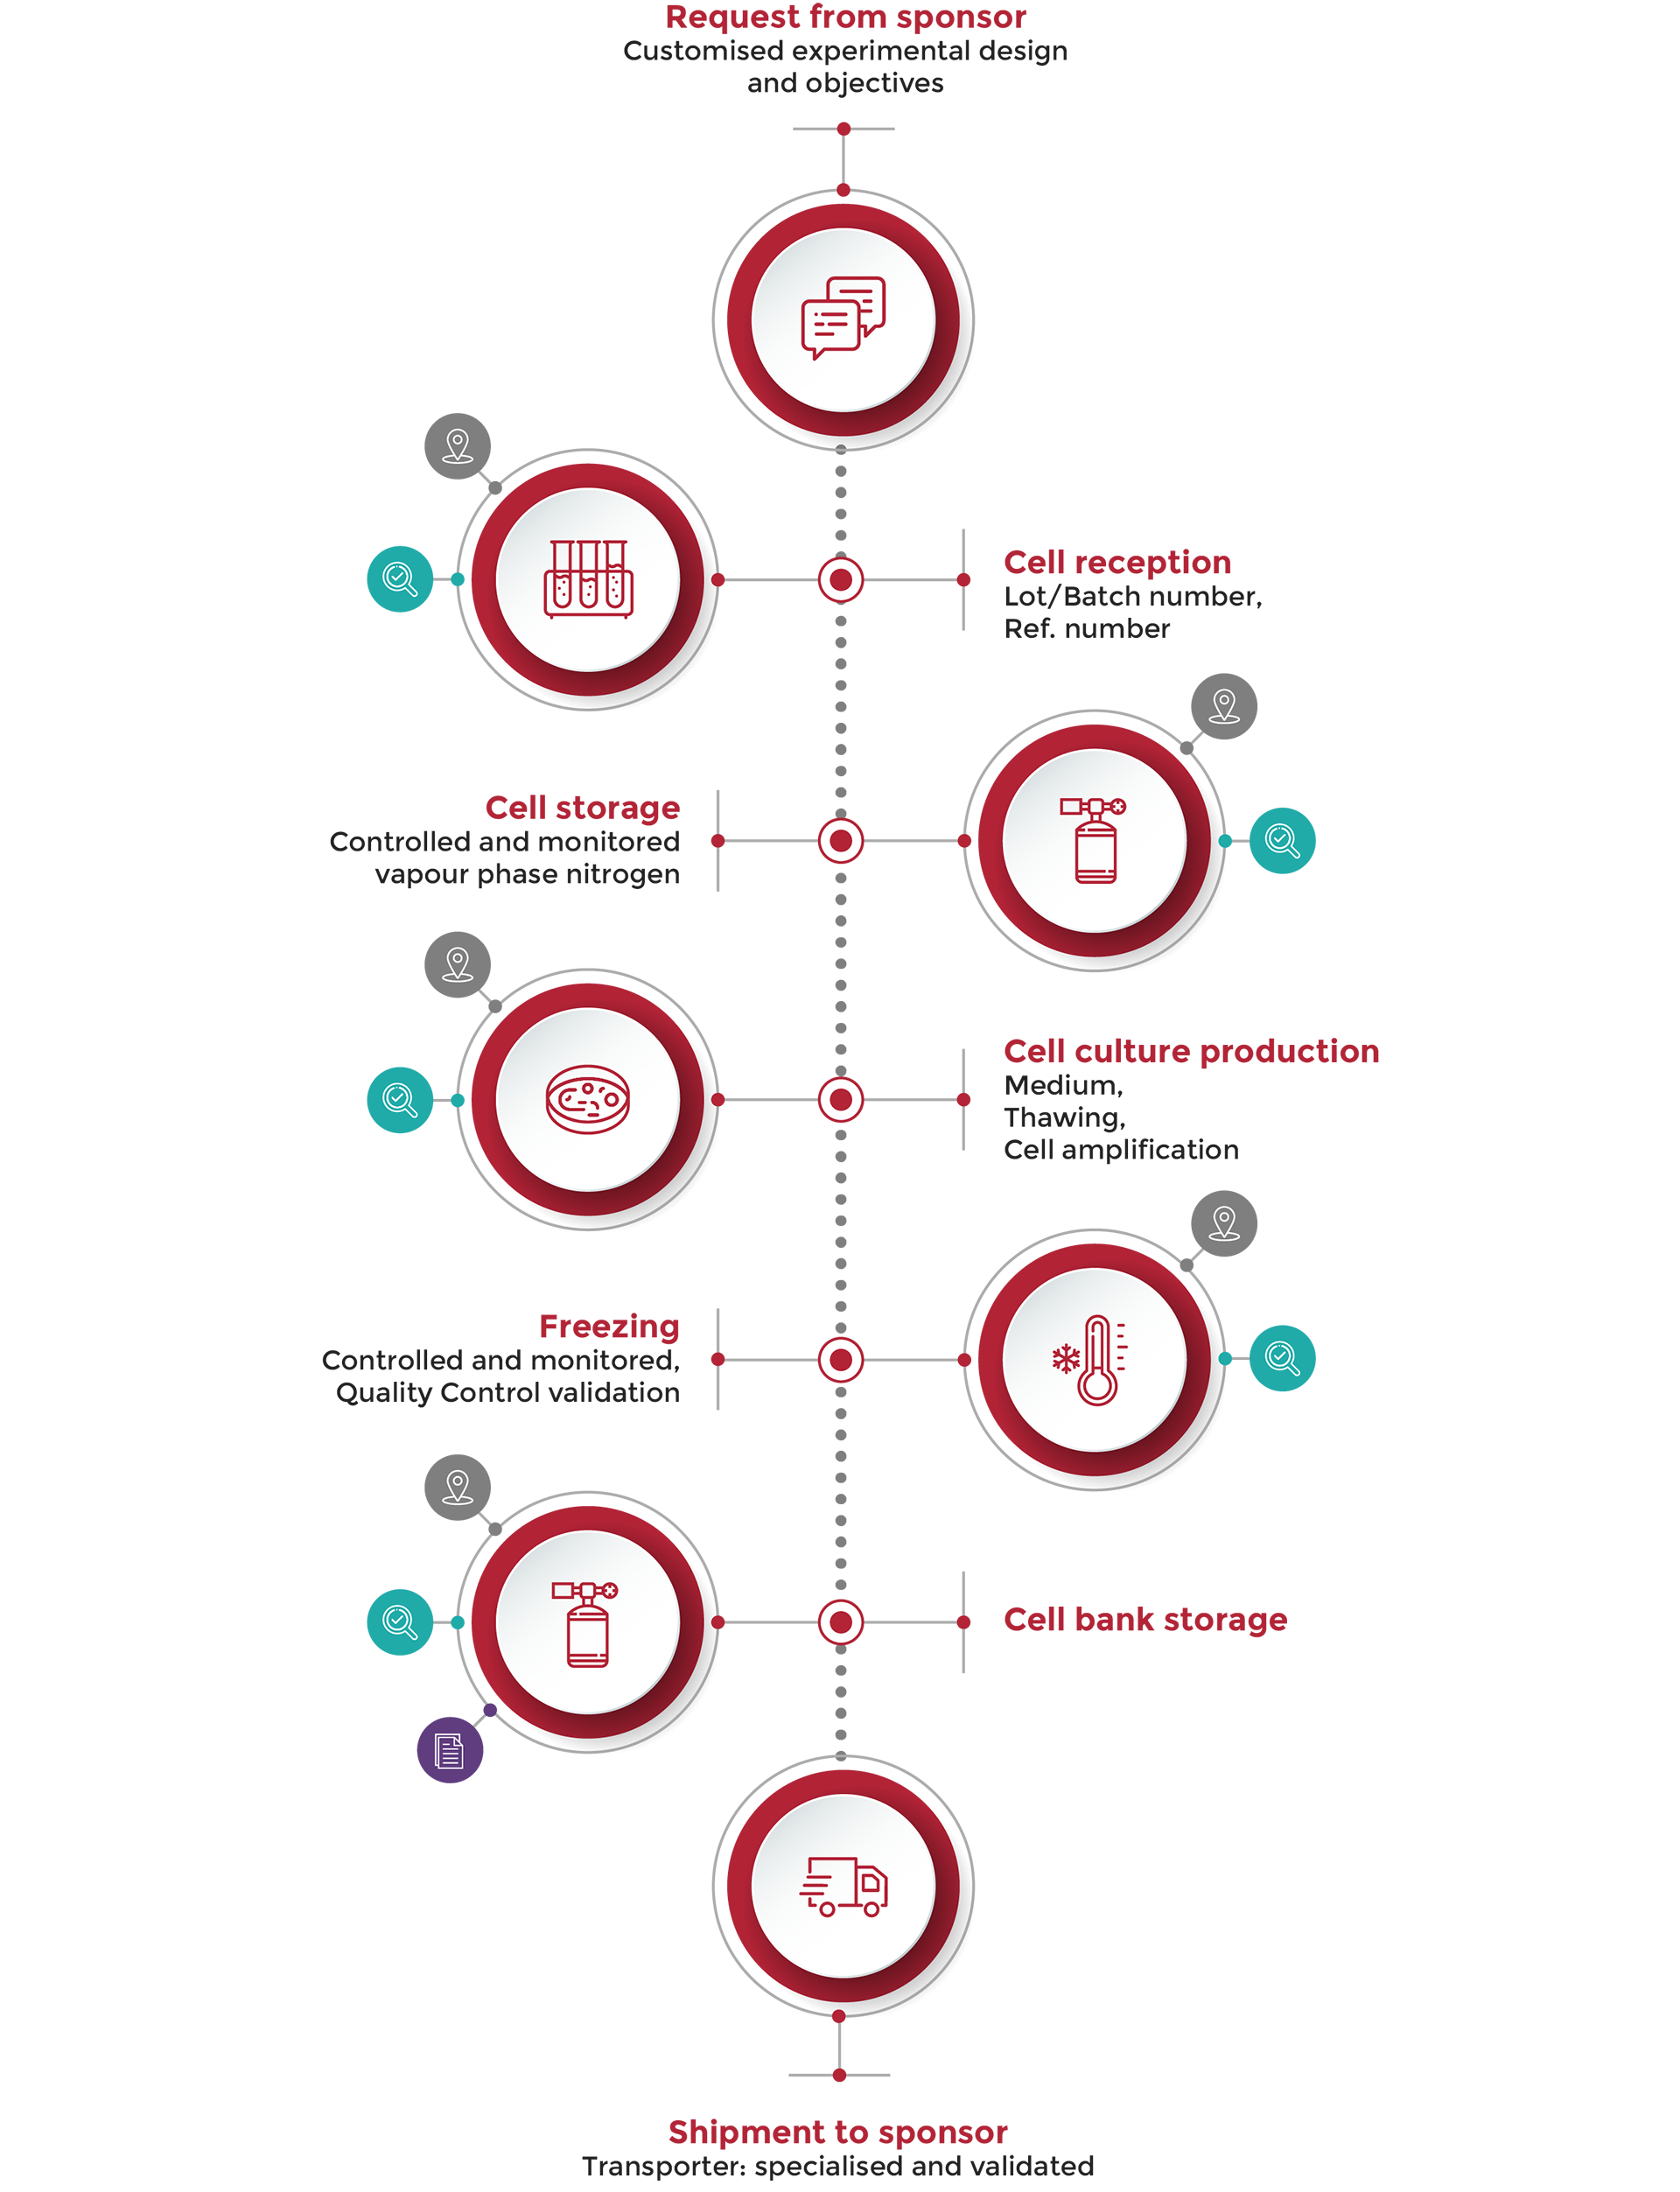 human-cell-design-schema-design-process-mobile-image